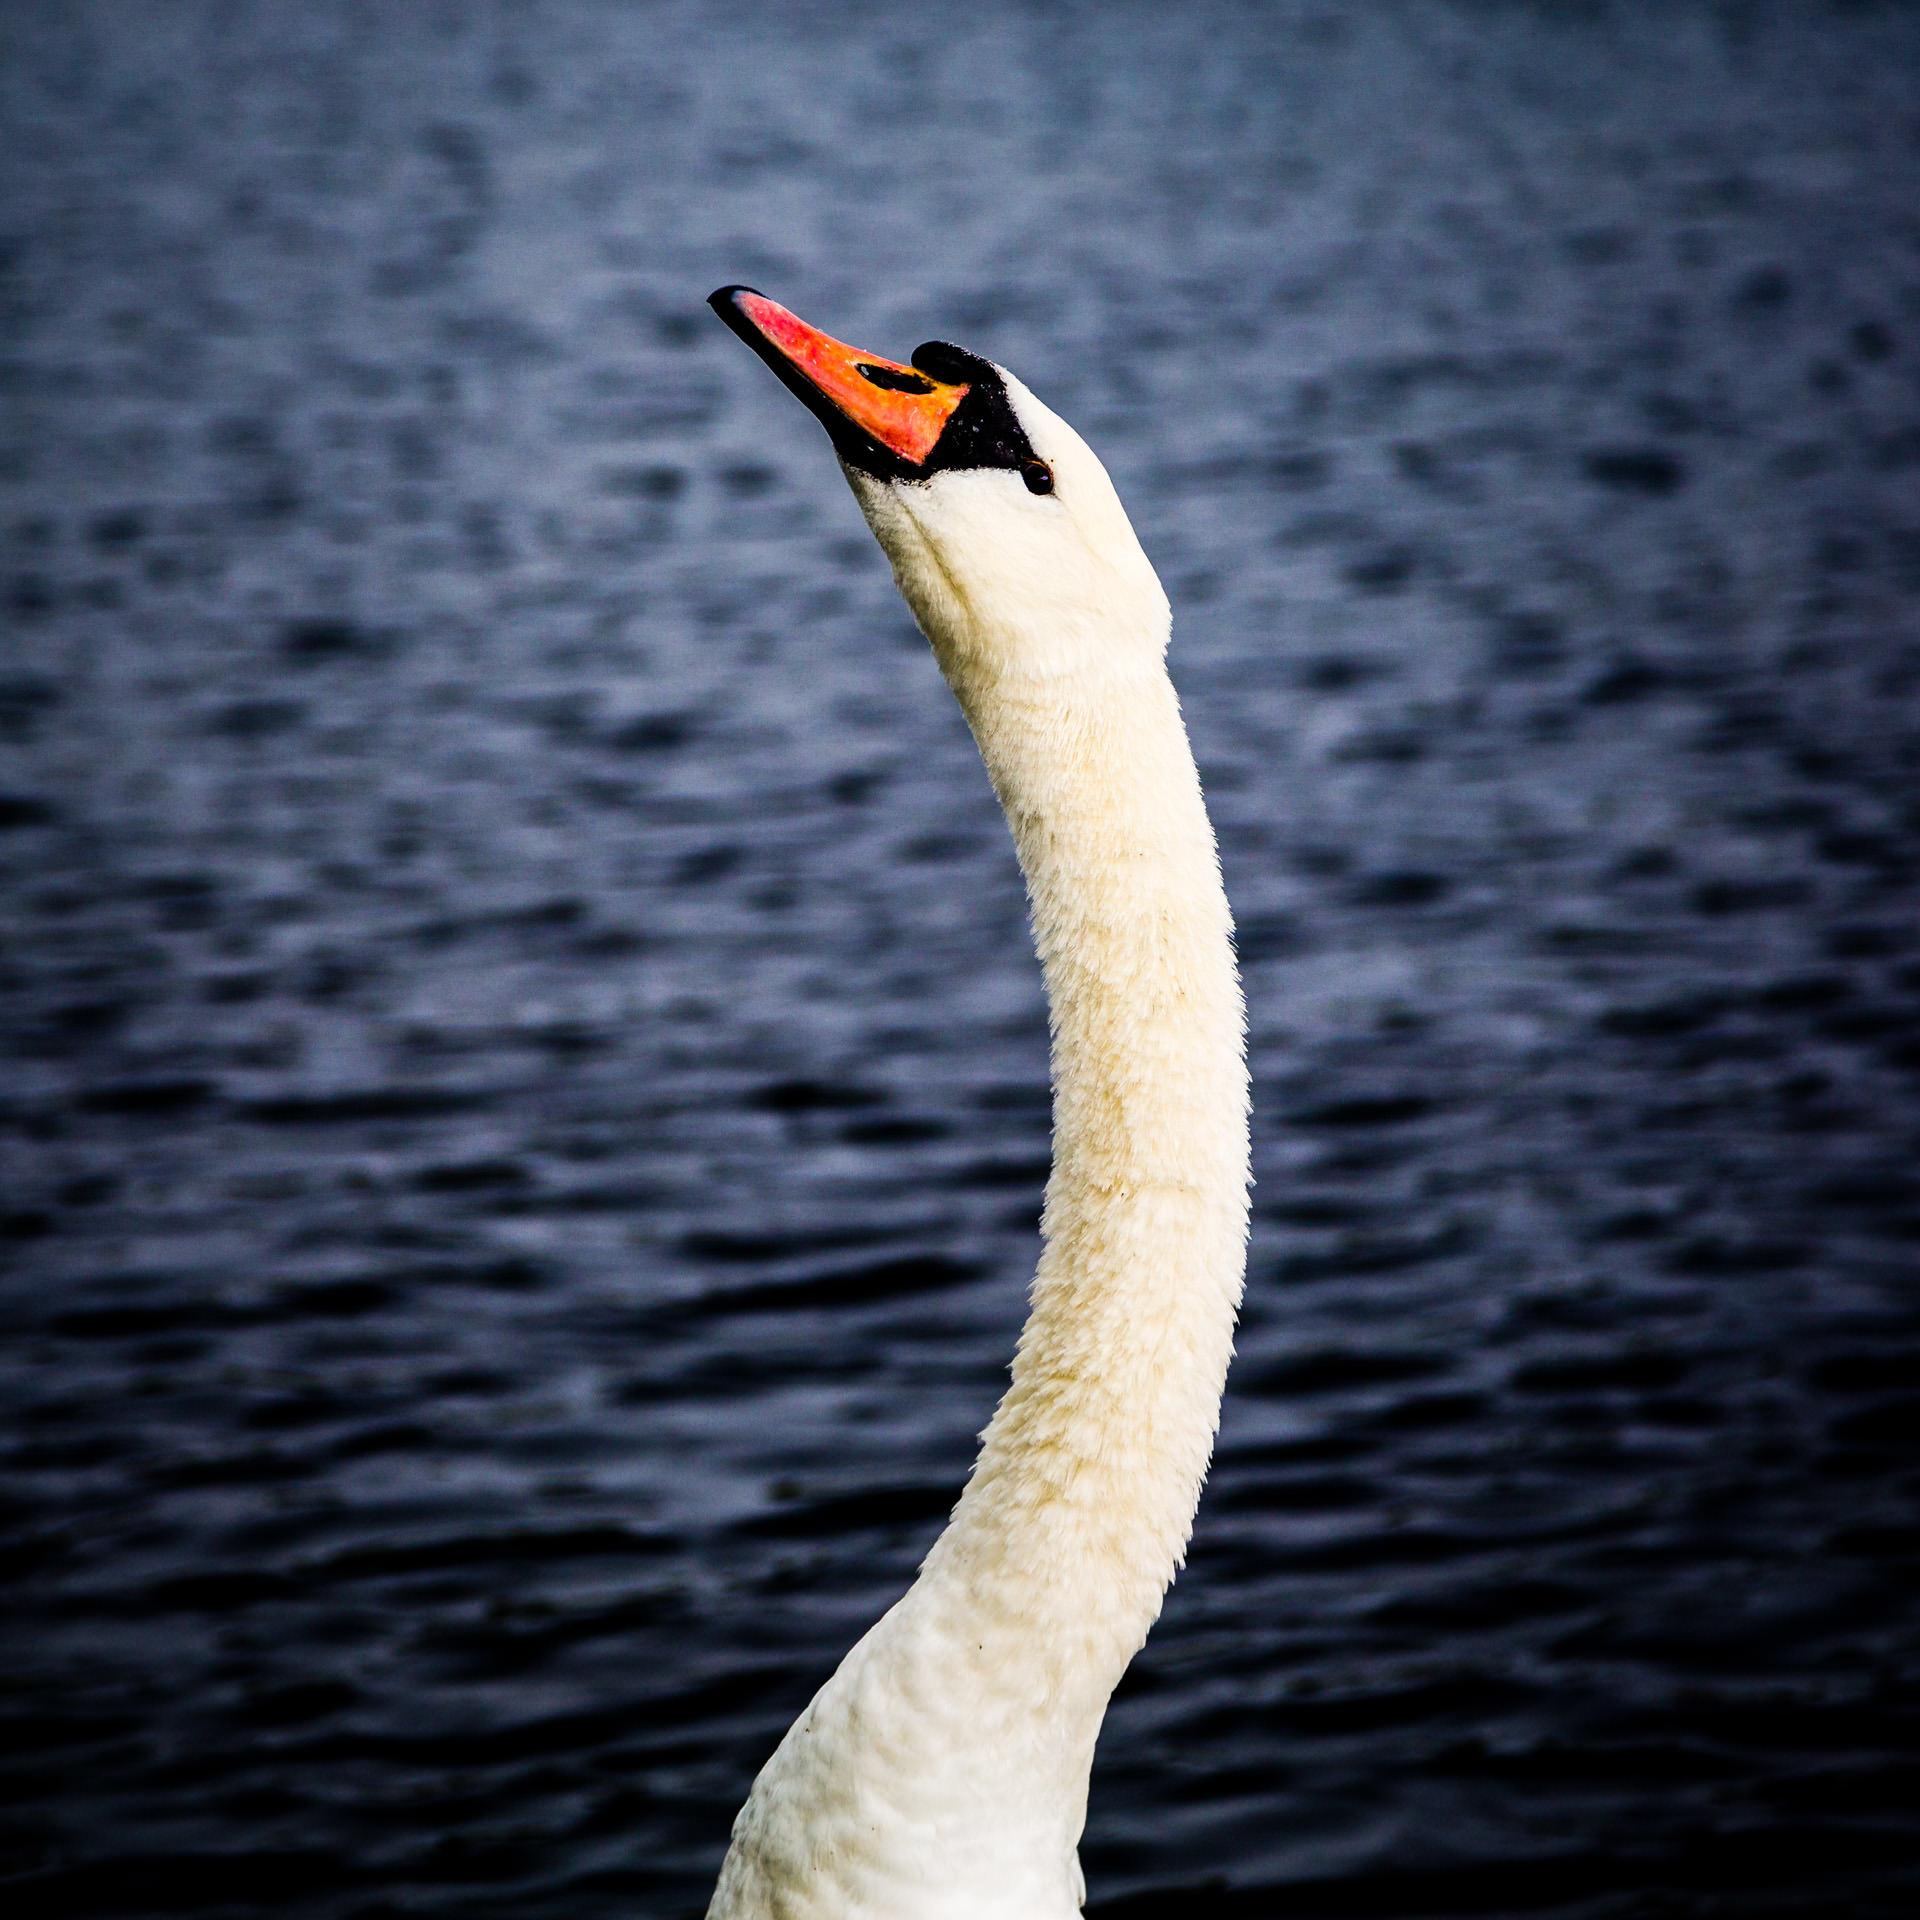 A swan kept a watchful eye on me in Eirias Park, Colwyn Bay.